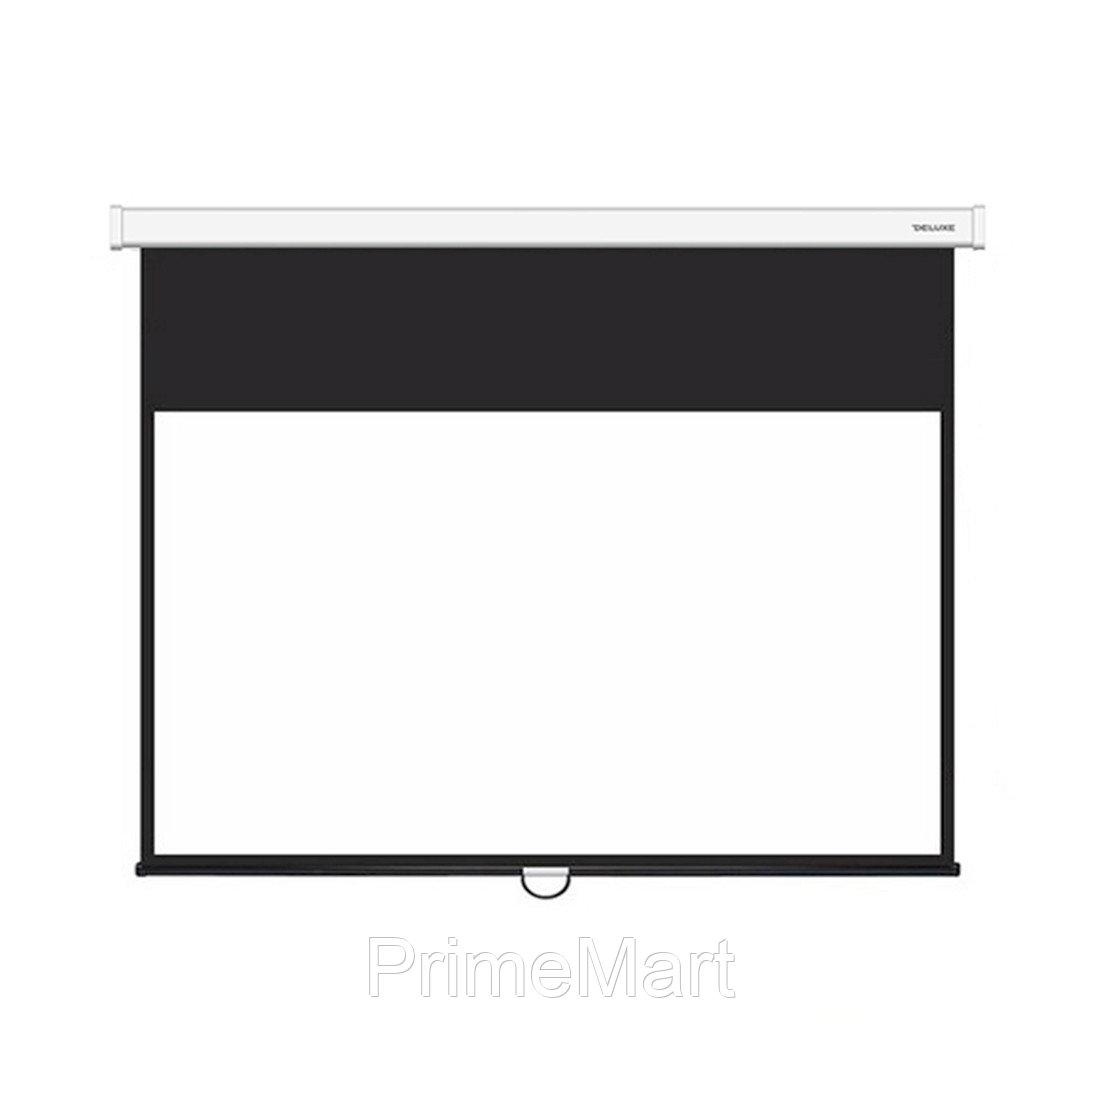 Экран, Deluxe, DLS-M240x135W, Настенный/потолочный, Рабочая поверхность 232x127, 16:9, Matt white, Белый